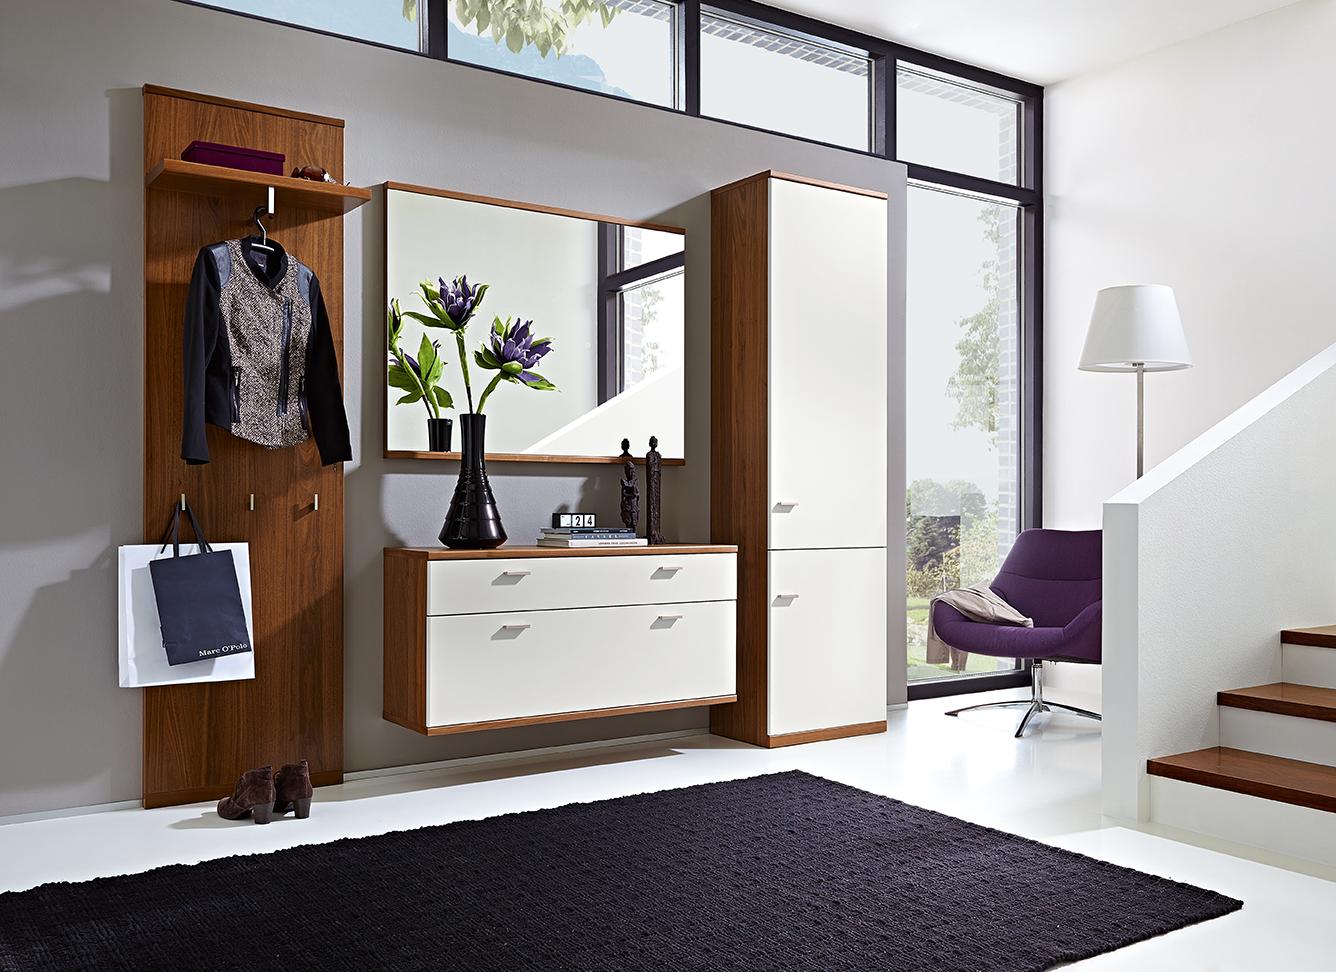 Galerie for 3 teilige garderobe